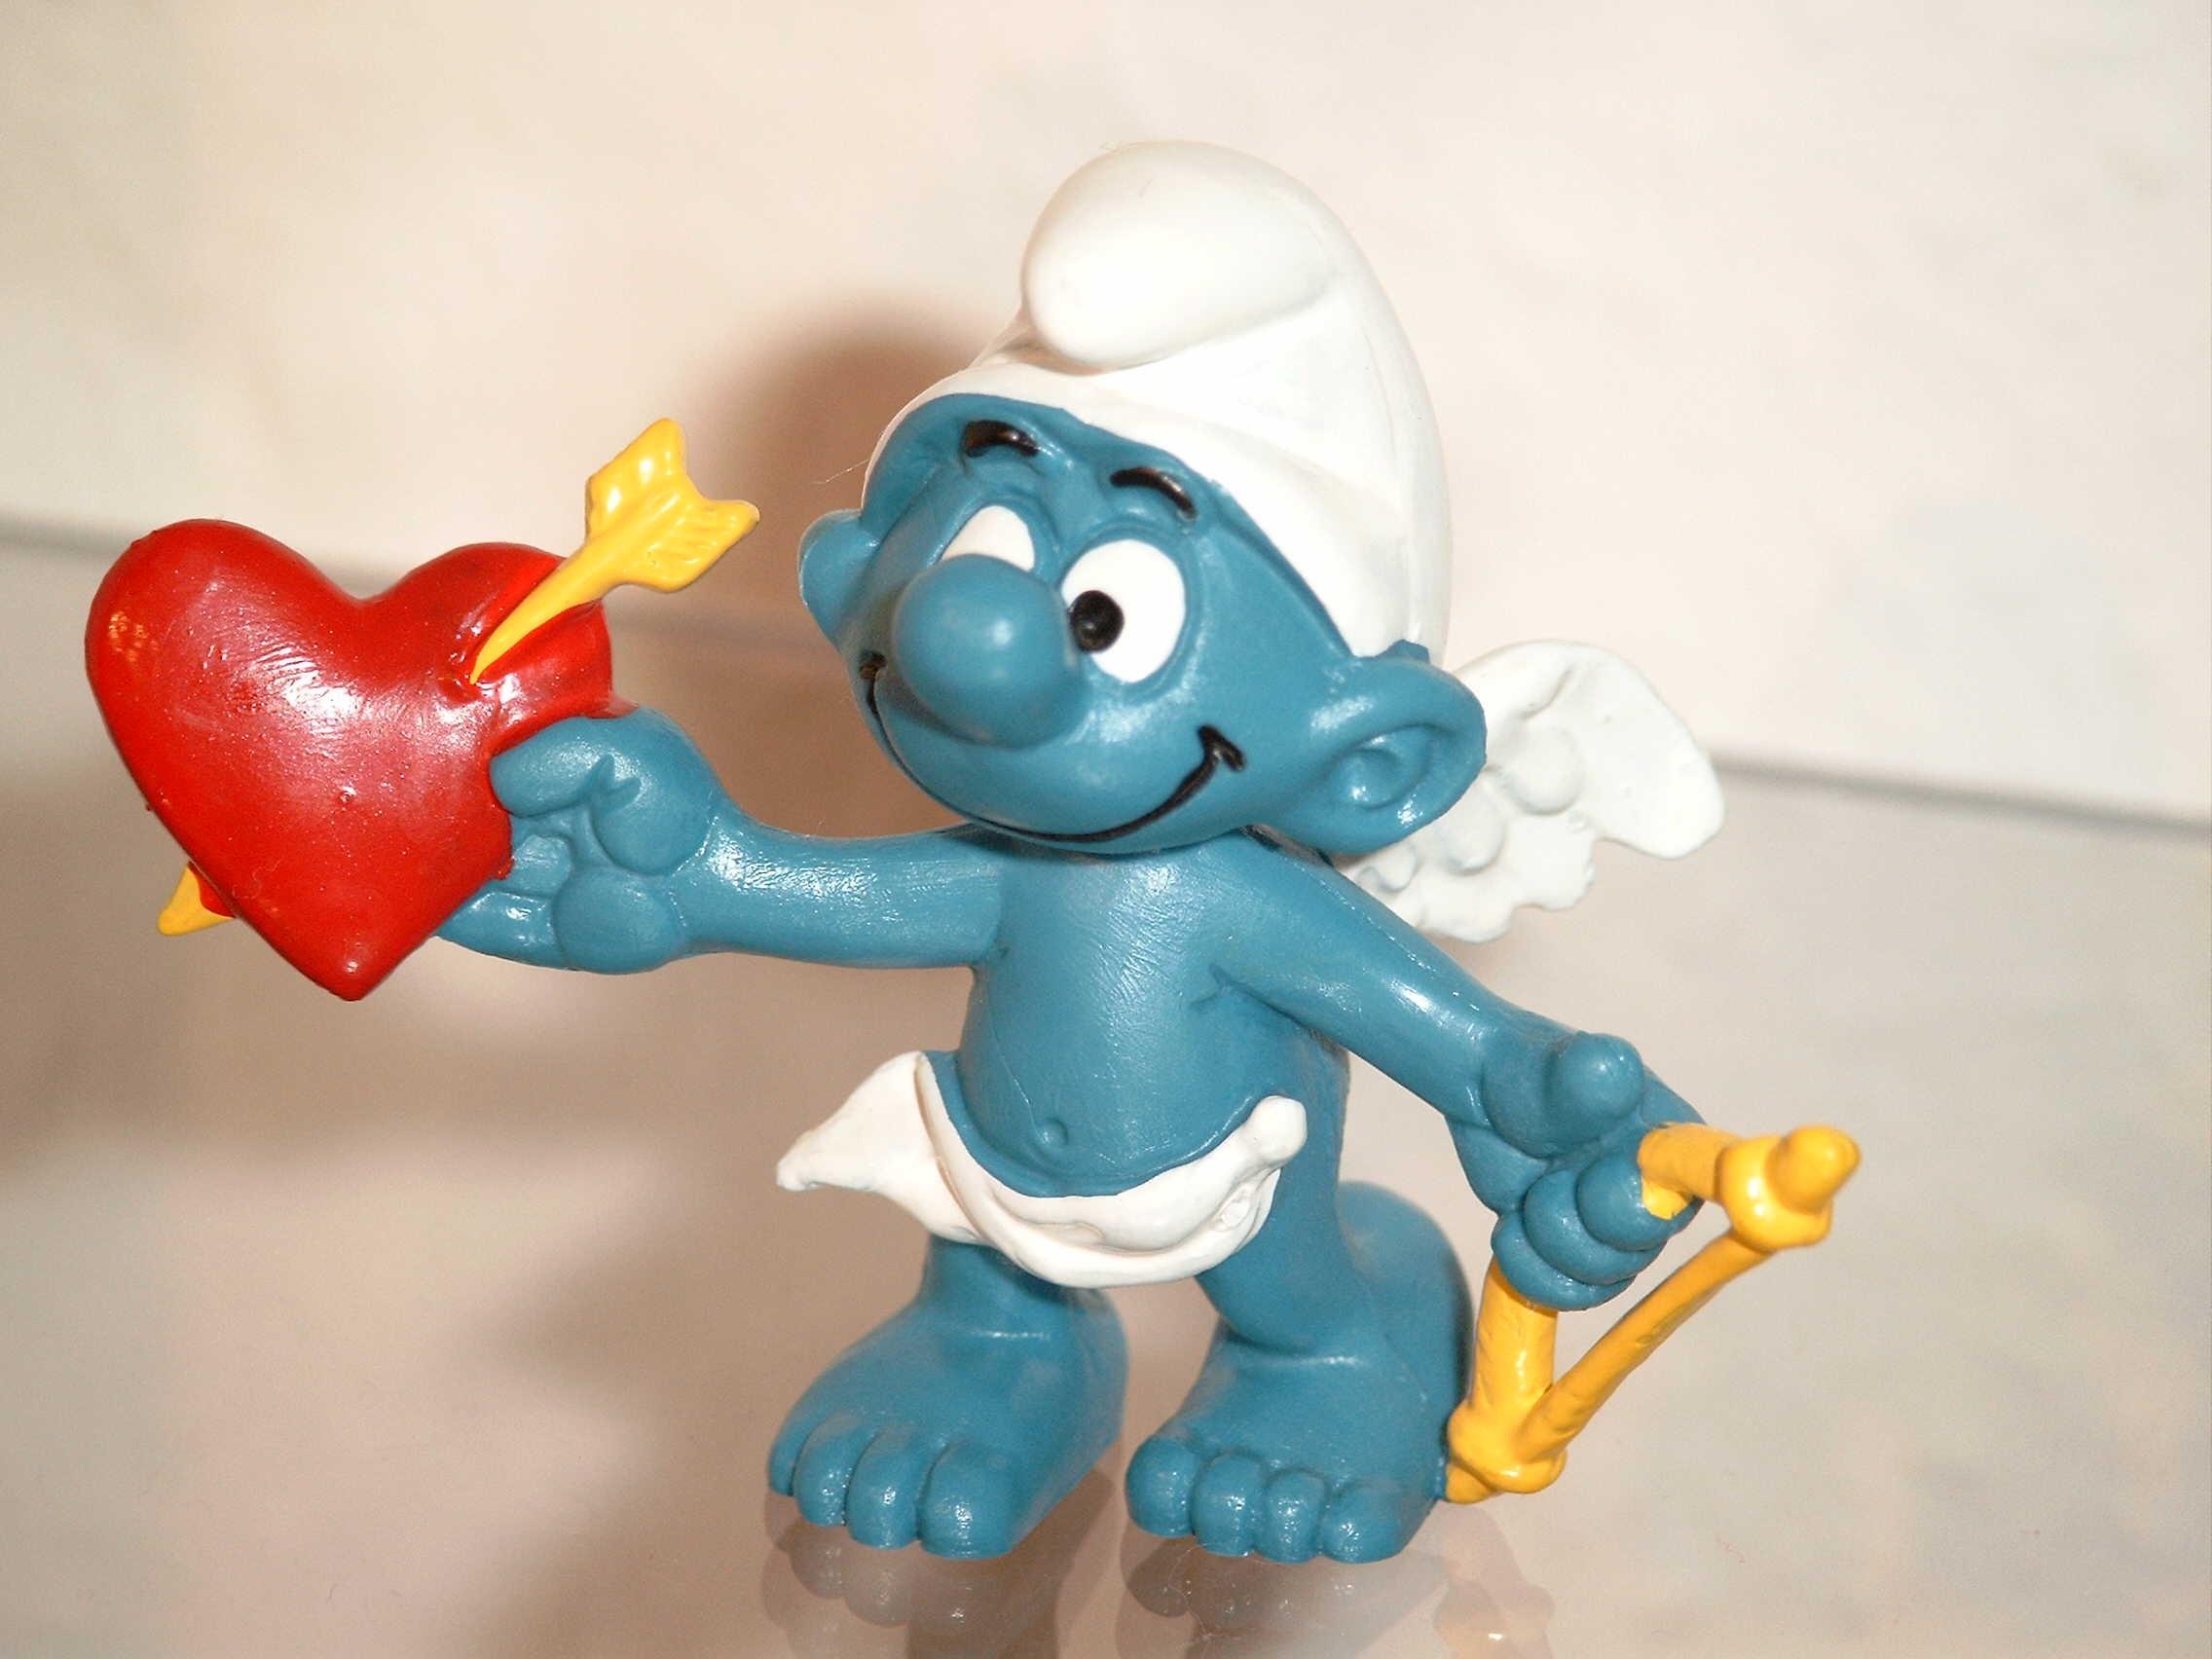 love heart blue toy arrow figurine amor smurfs smurf stuffed toy